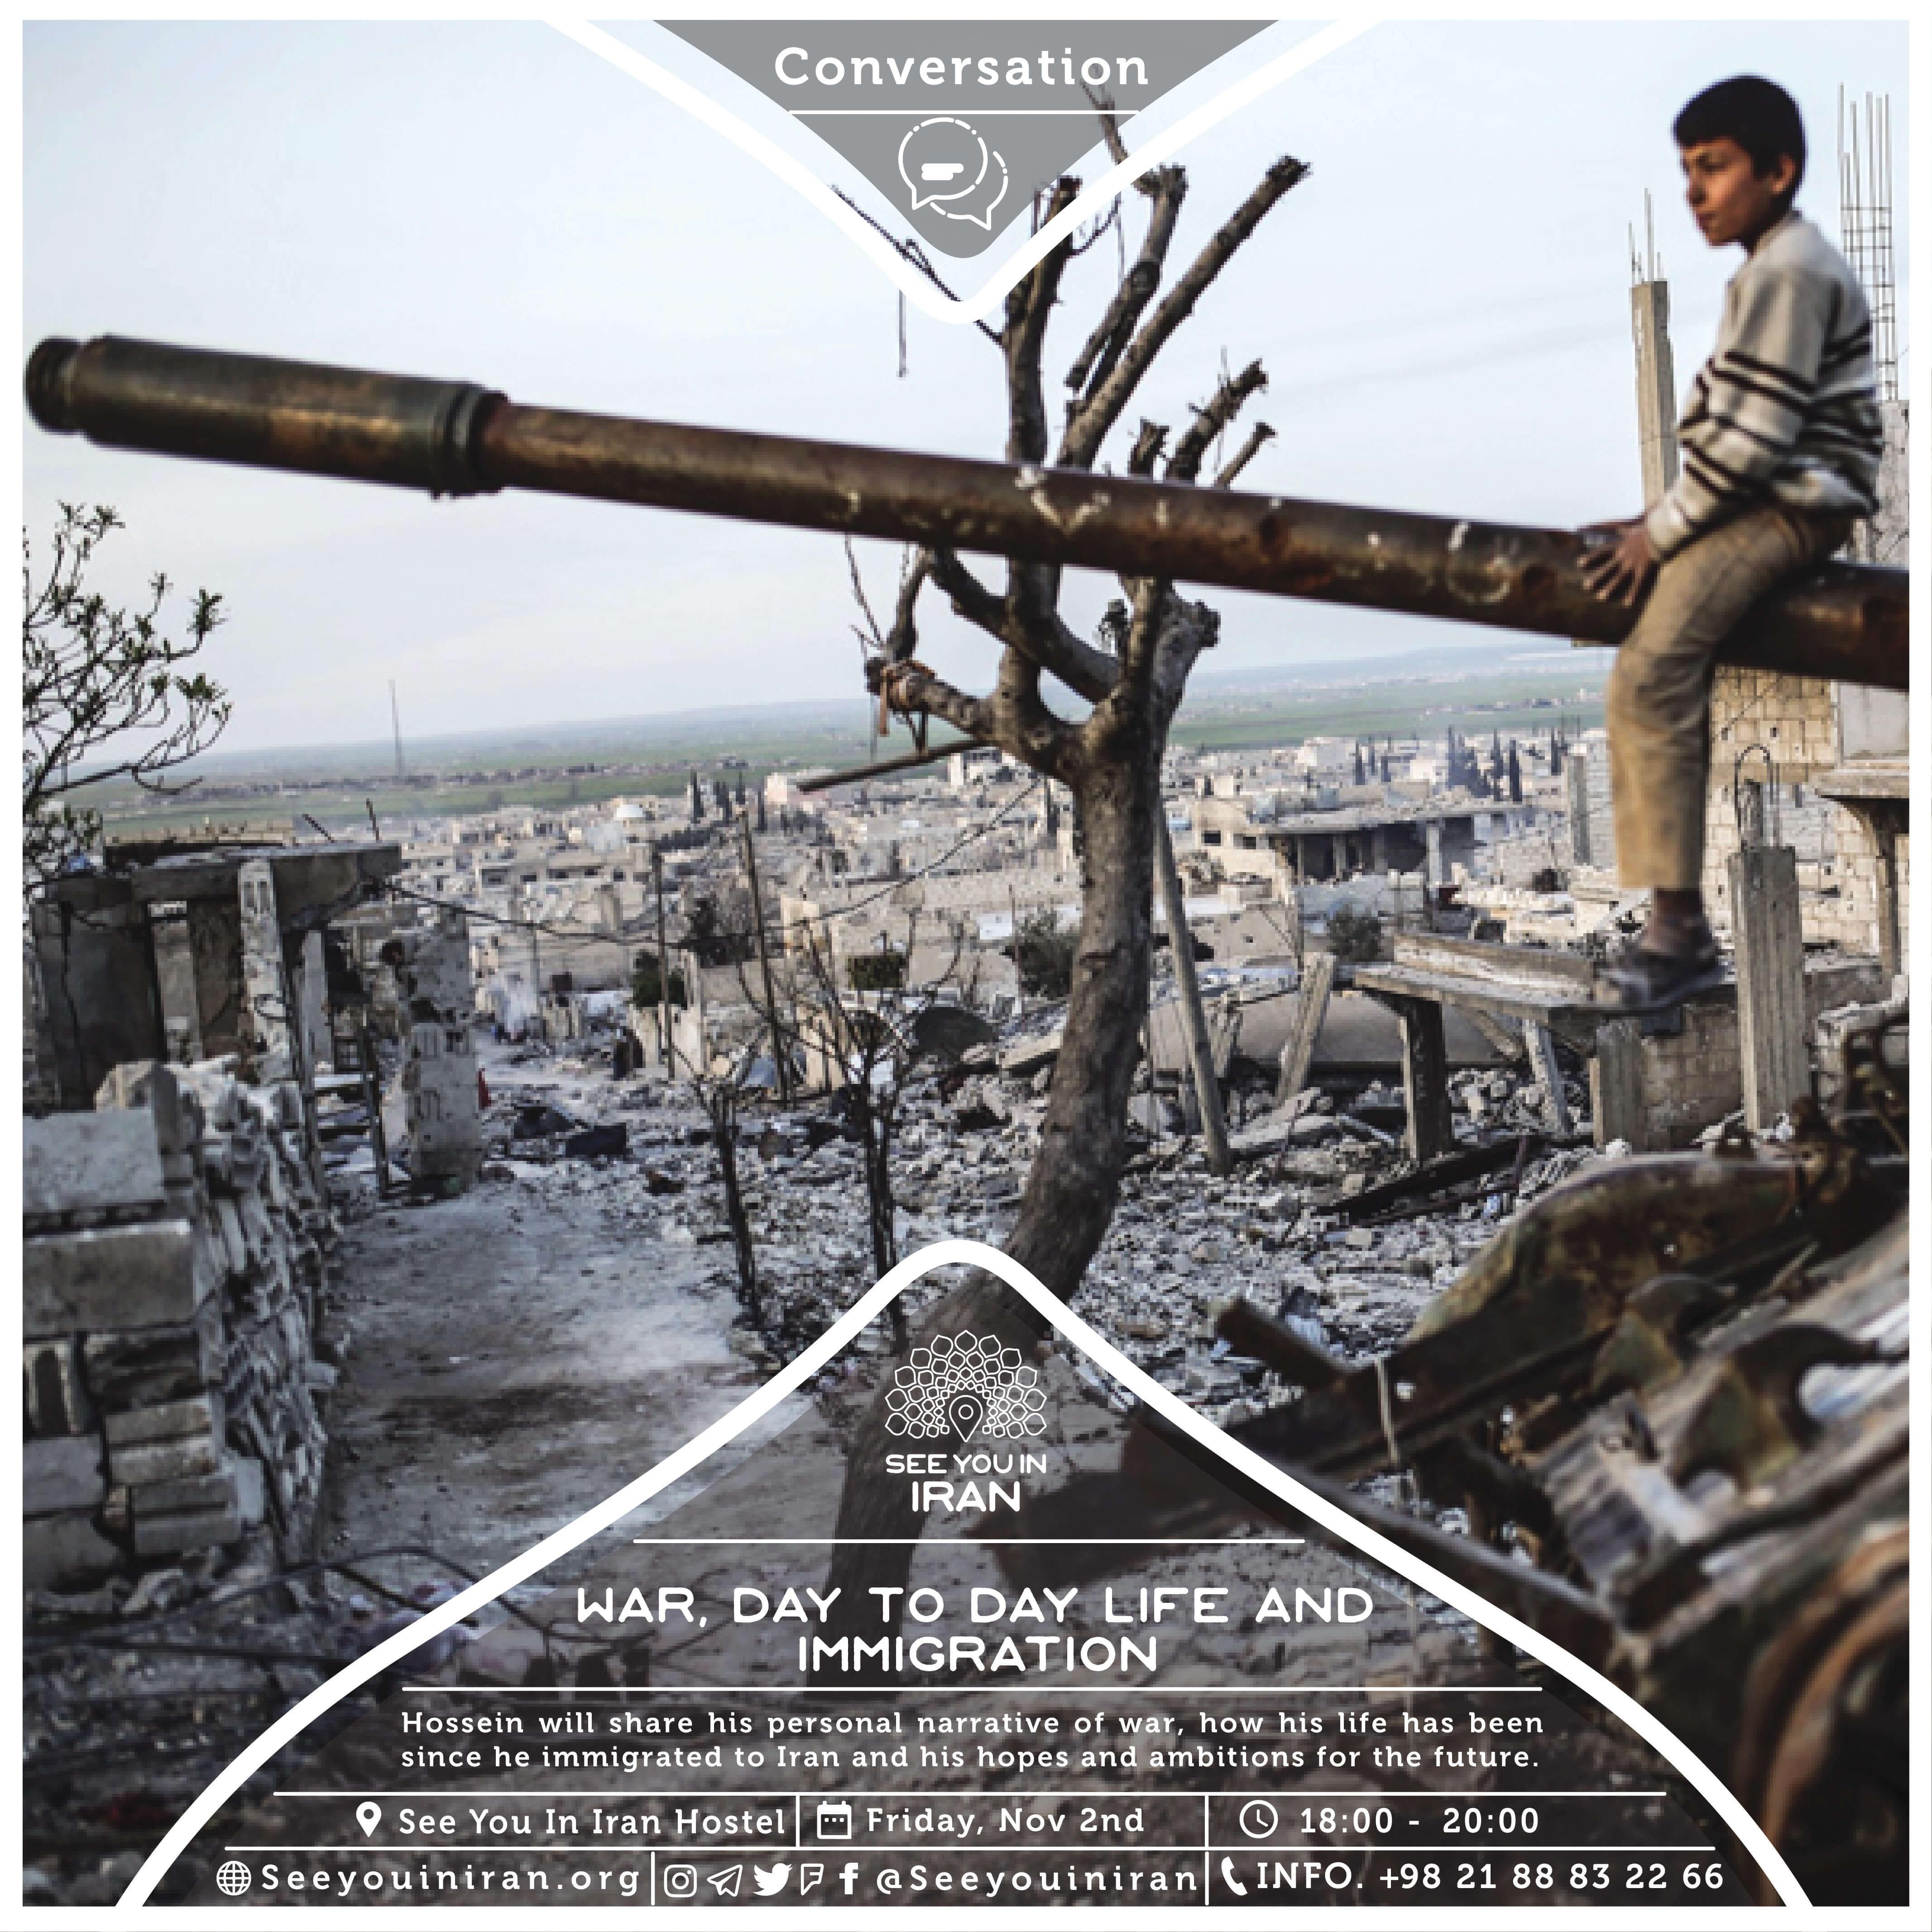 war day poster